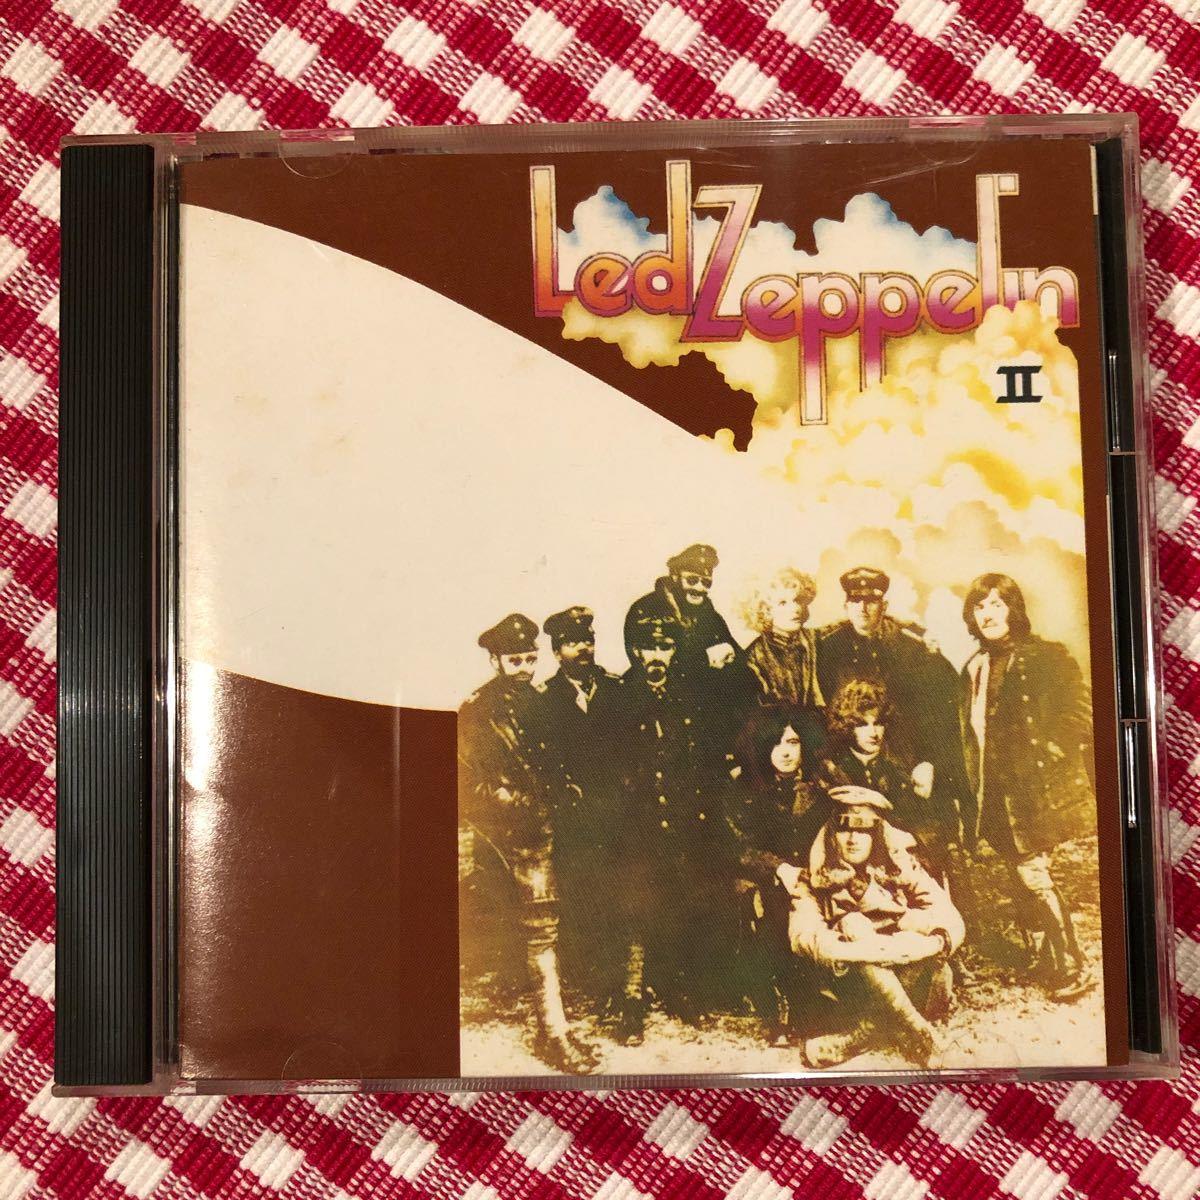 LED ZEPPELIN(レッド・ツェッペリン) CD